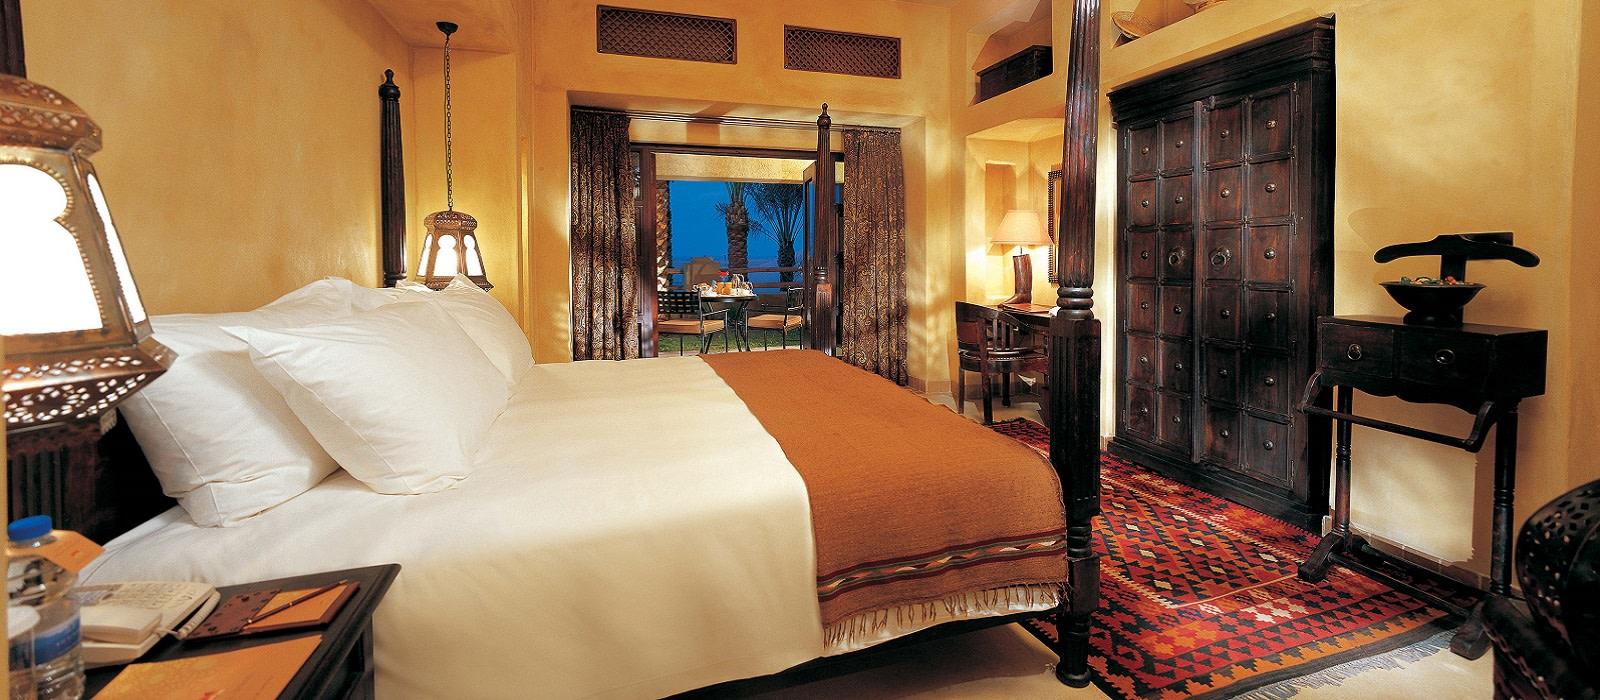 Hotel Bab Al Shams Desert Resort & Spa Oman